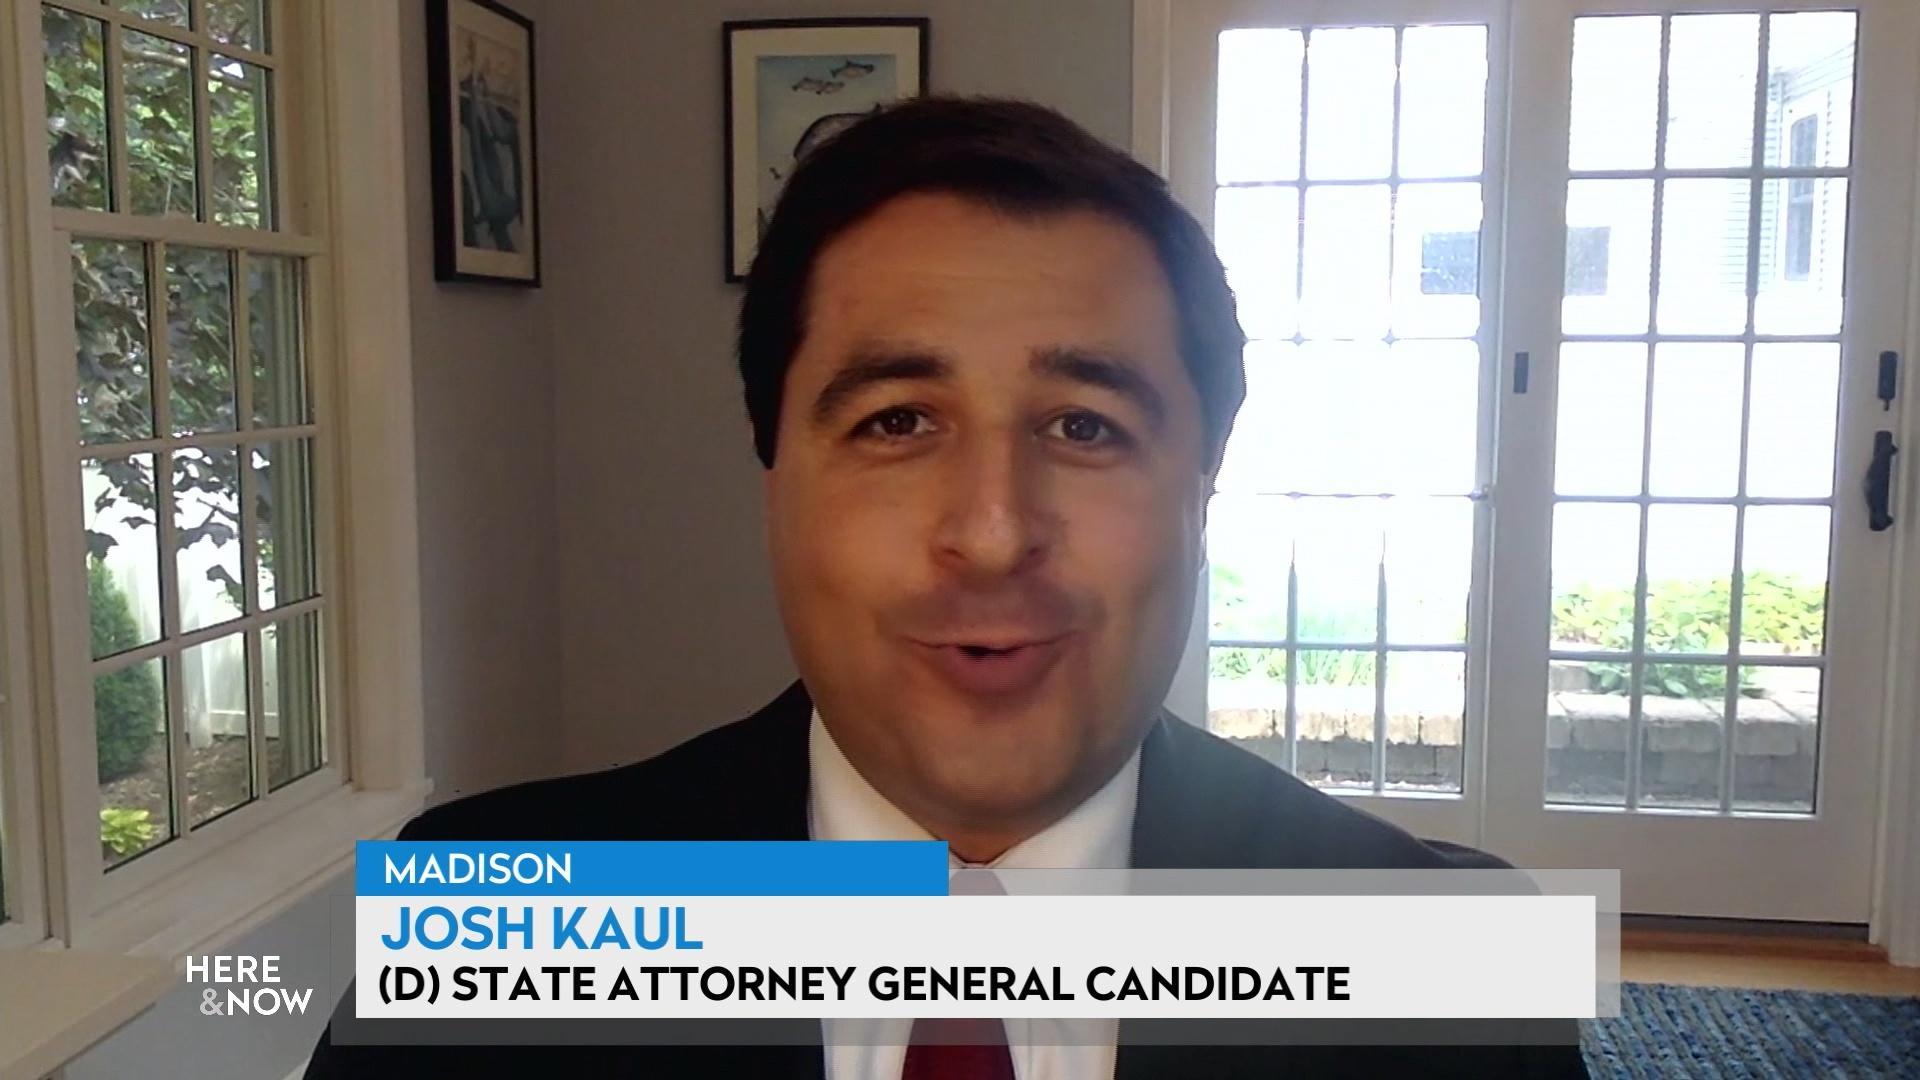 Kaul on 2022 Attorney General Run